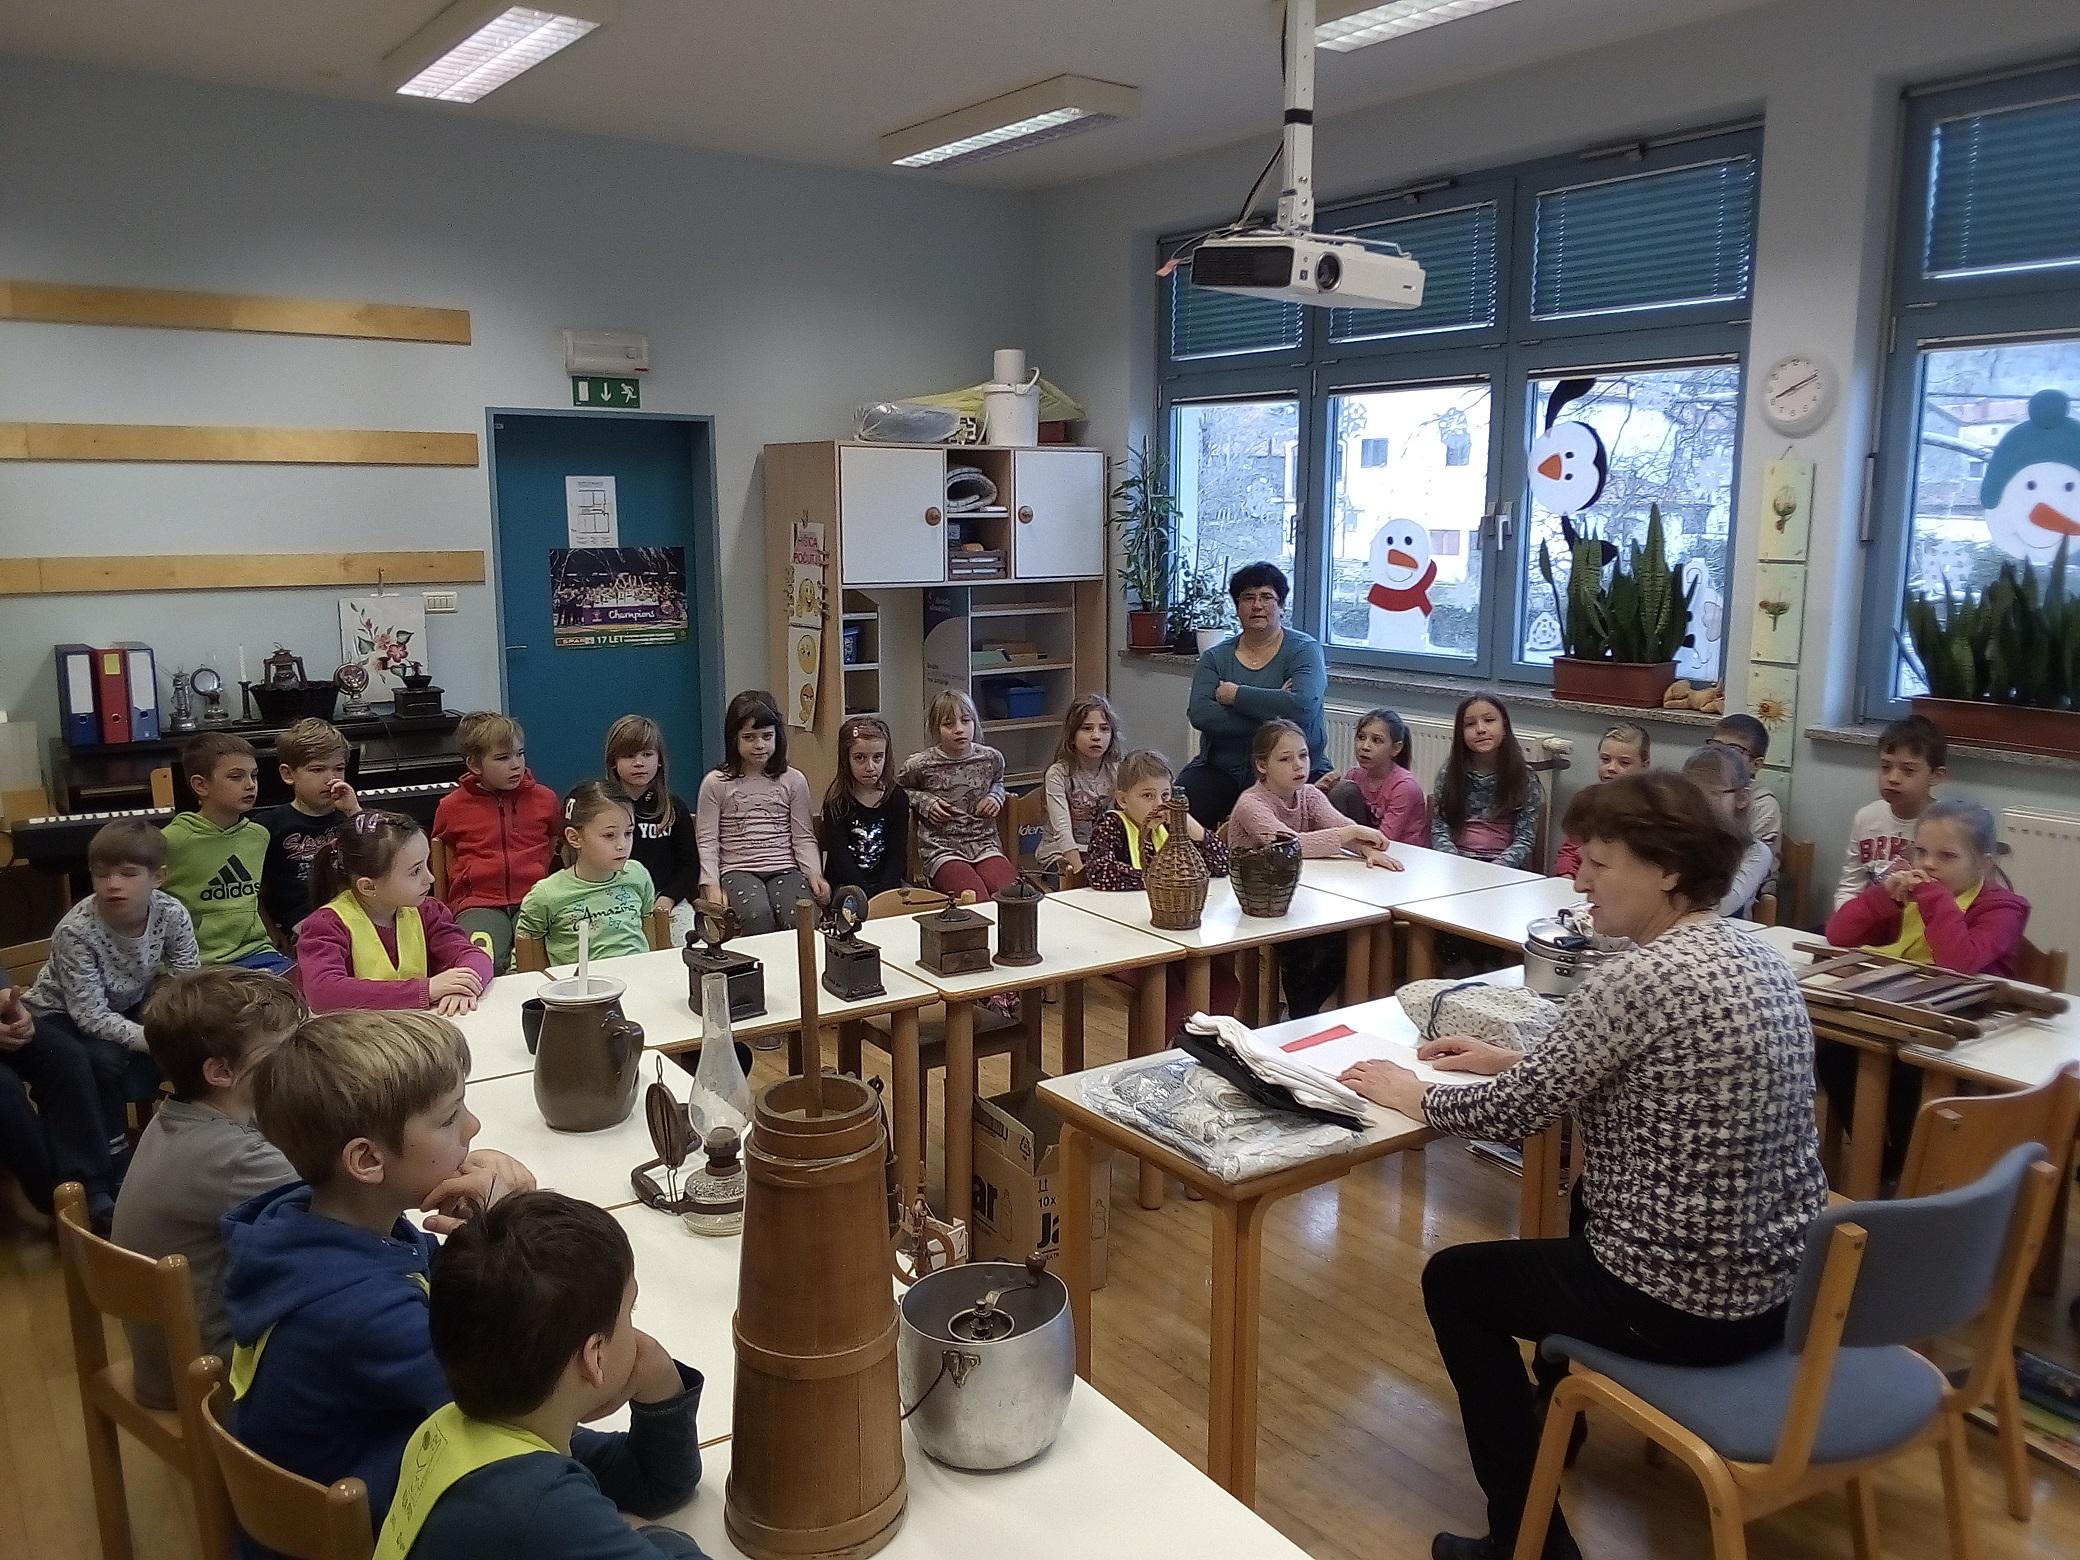 Zgodovinarka Lilijan Vidrih Lavrenčič na obisku v Podnanosu - 6.2.2018 - foto Vida Trošt Vidic (2)